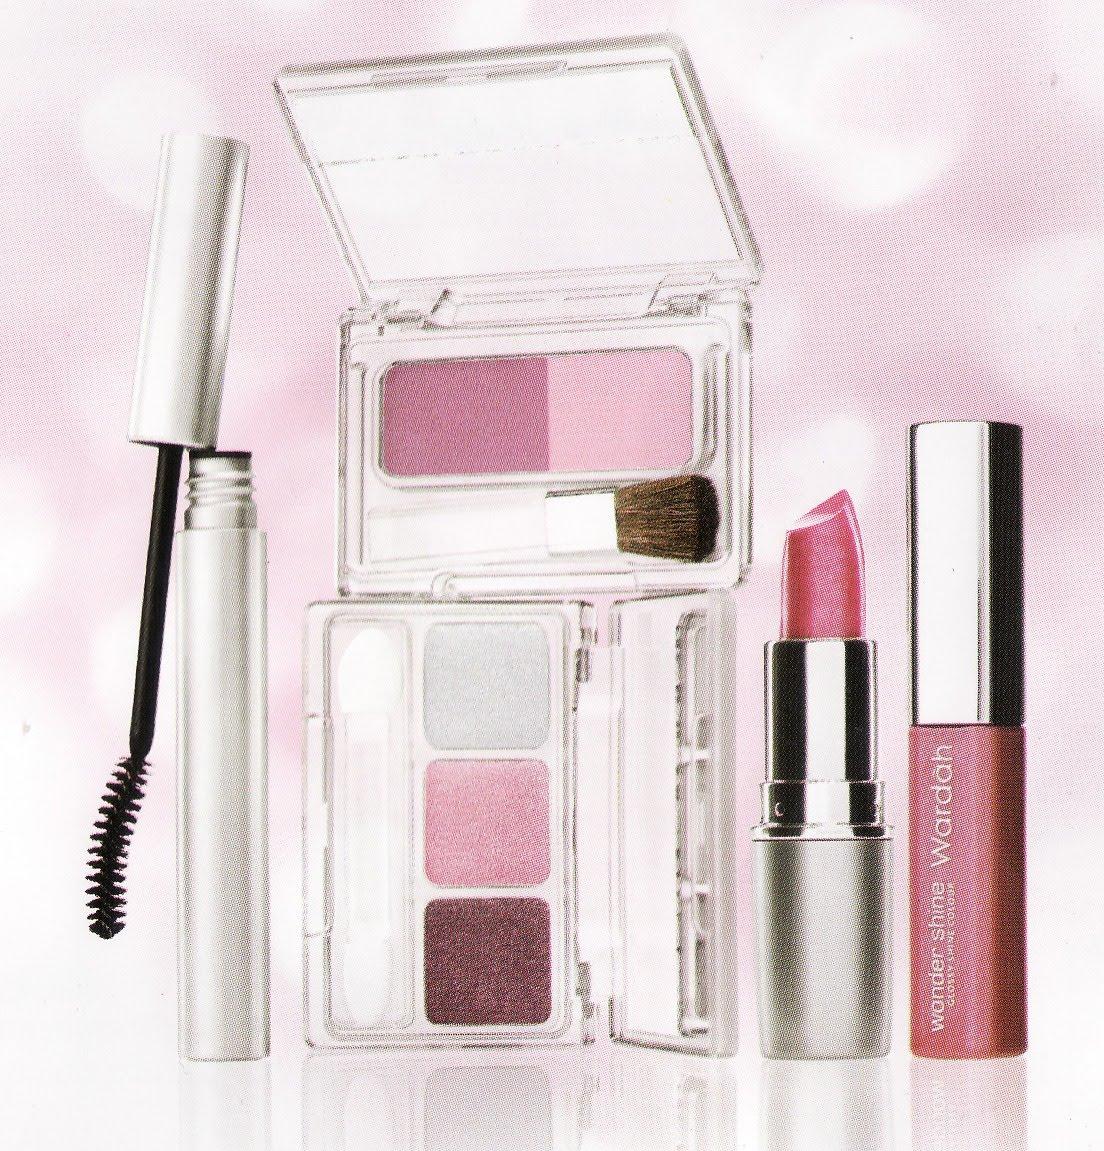 Toko Kosmetik Halal: Daftar Harga Produk Wardah Cosmetics